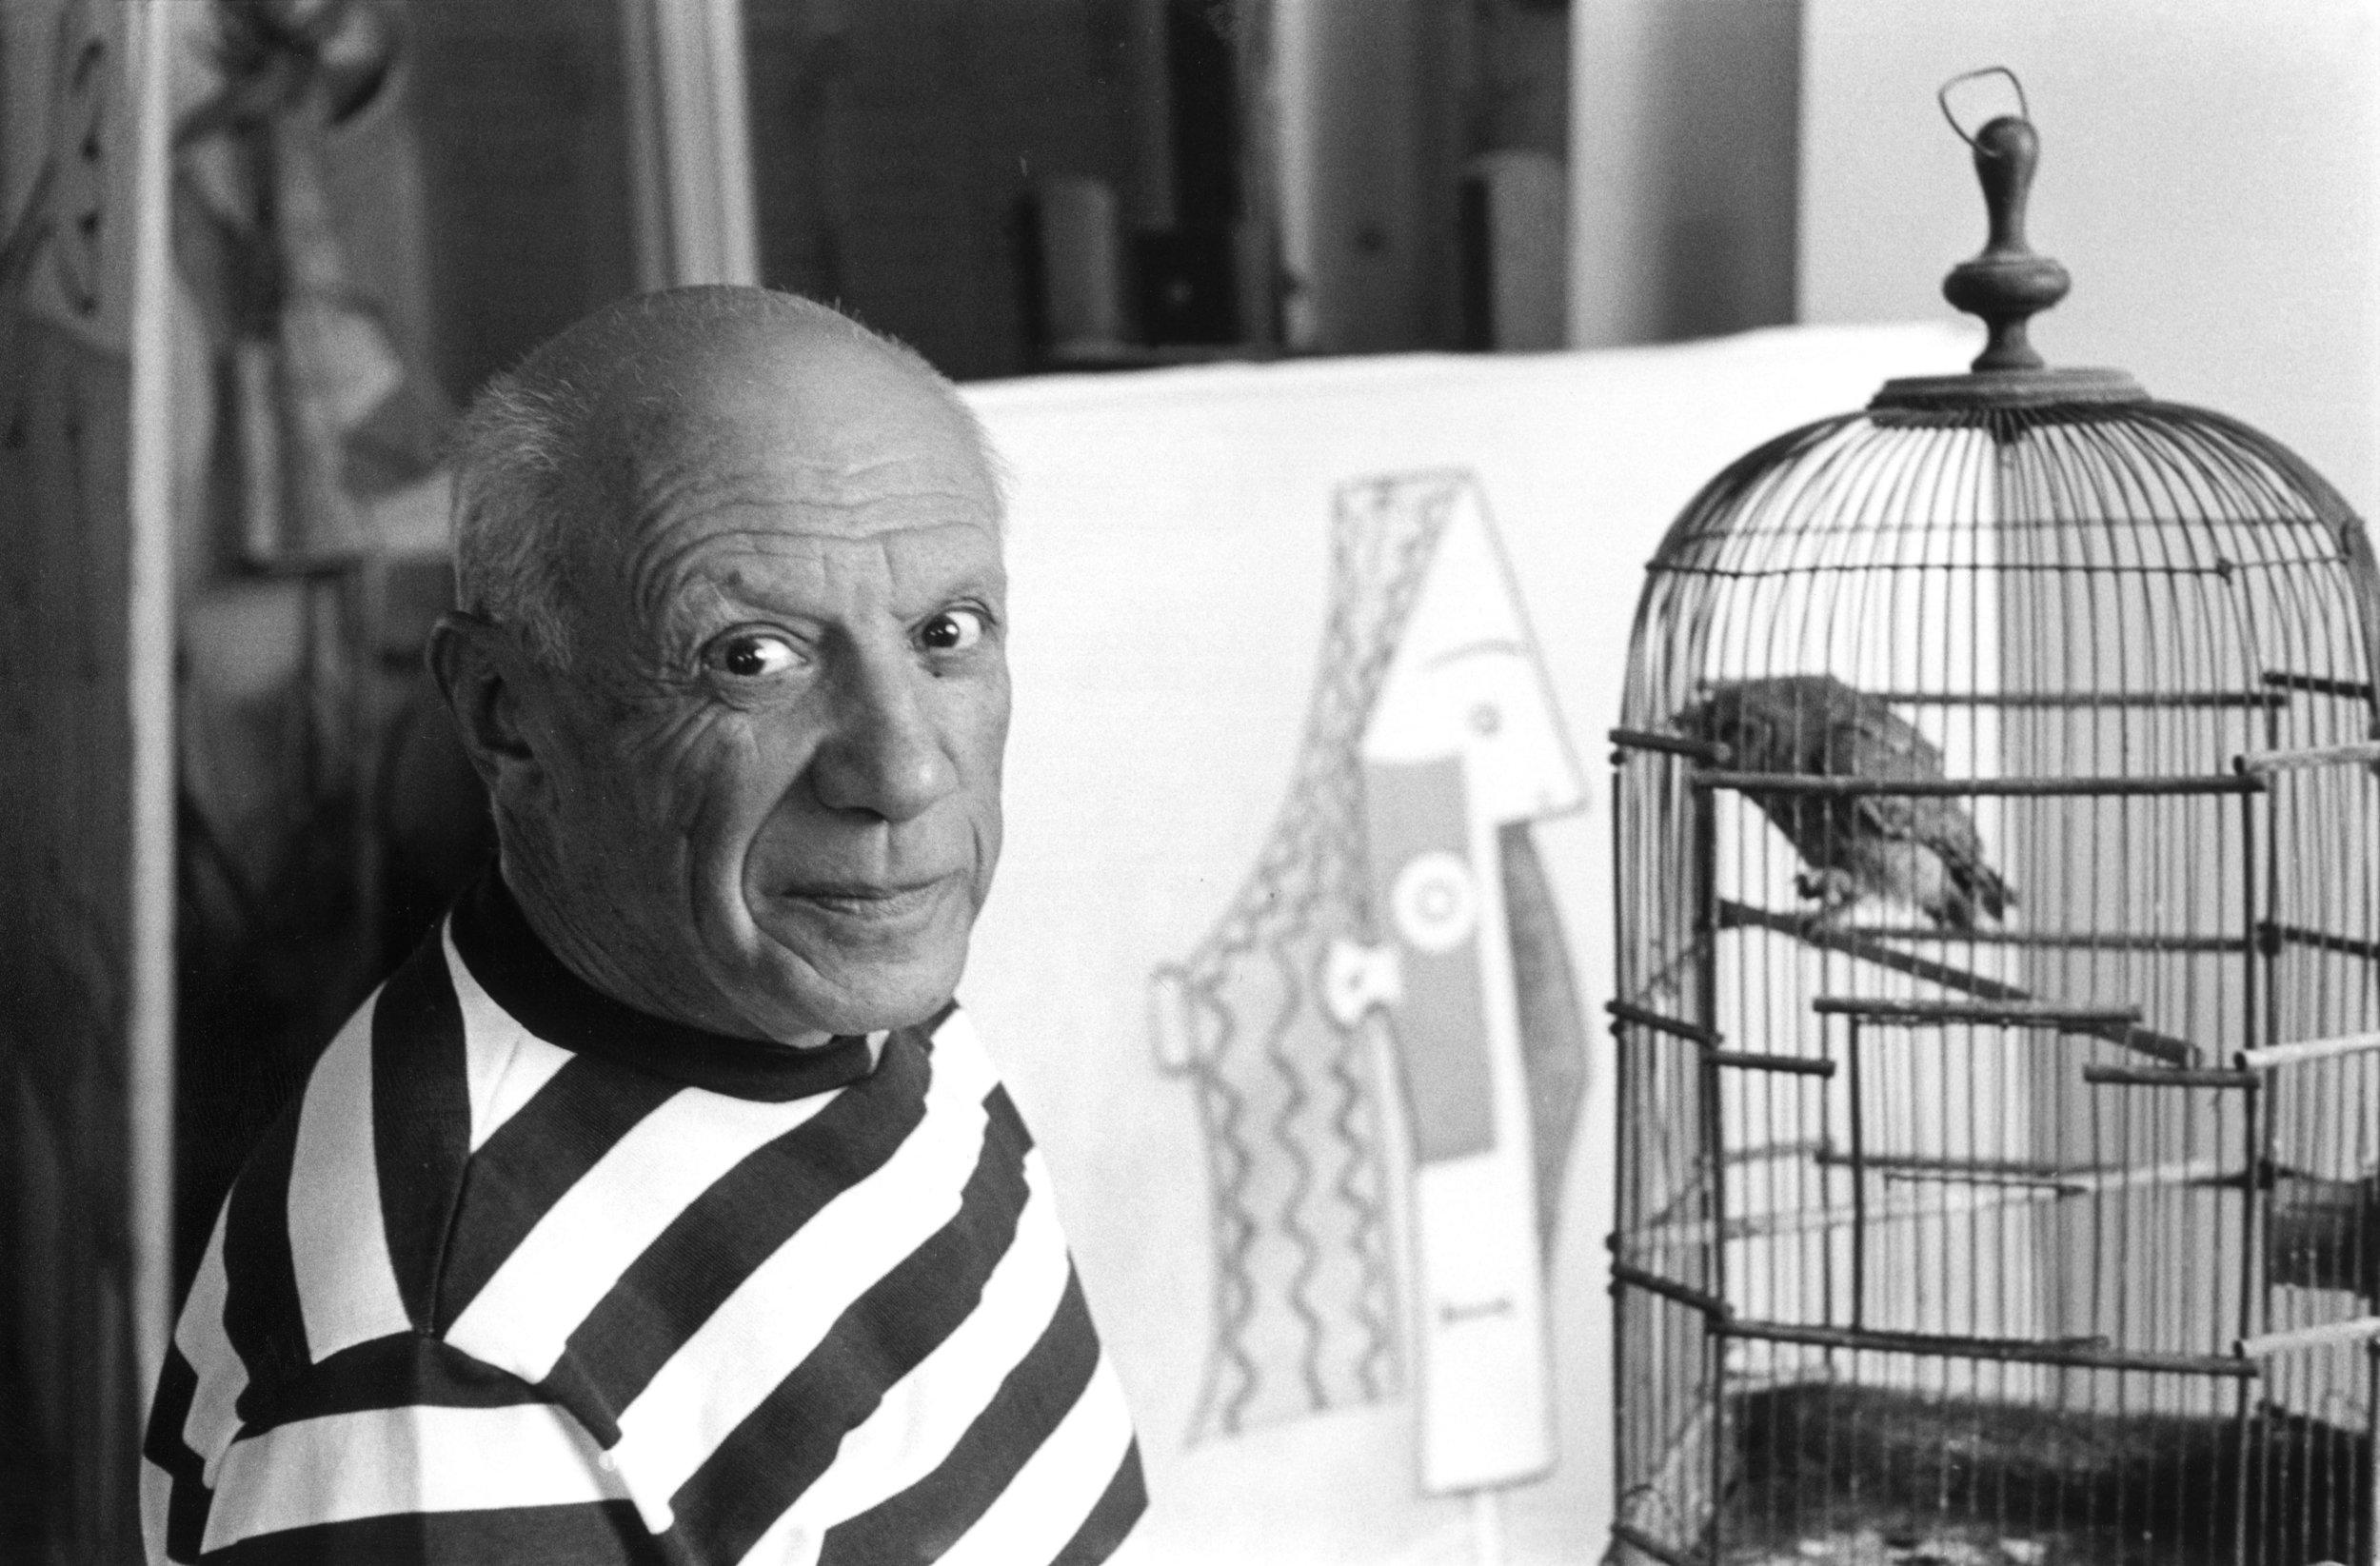 pablo-picasso-René-Burri-Magnum-Photos-1957-breton-stripe-style-one-who-dresses-5.jpg